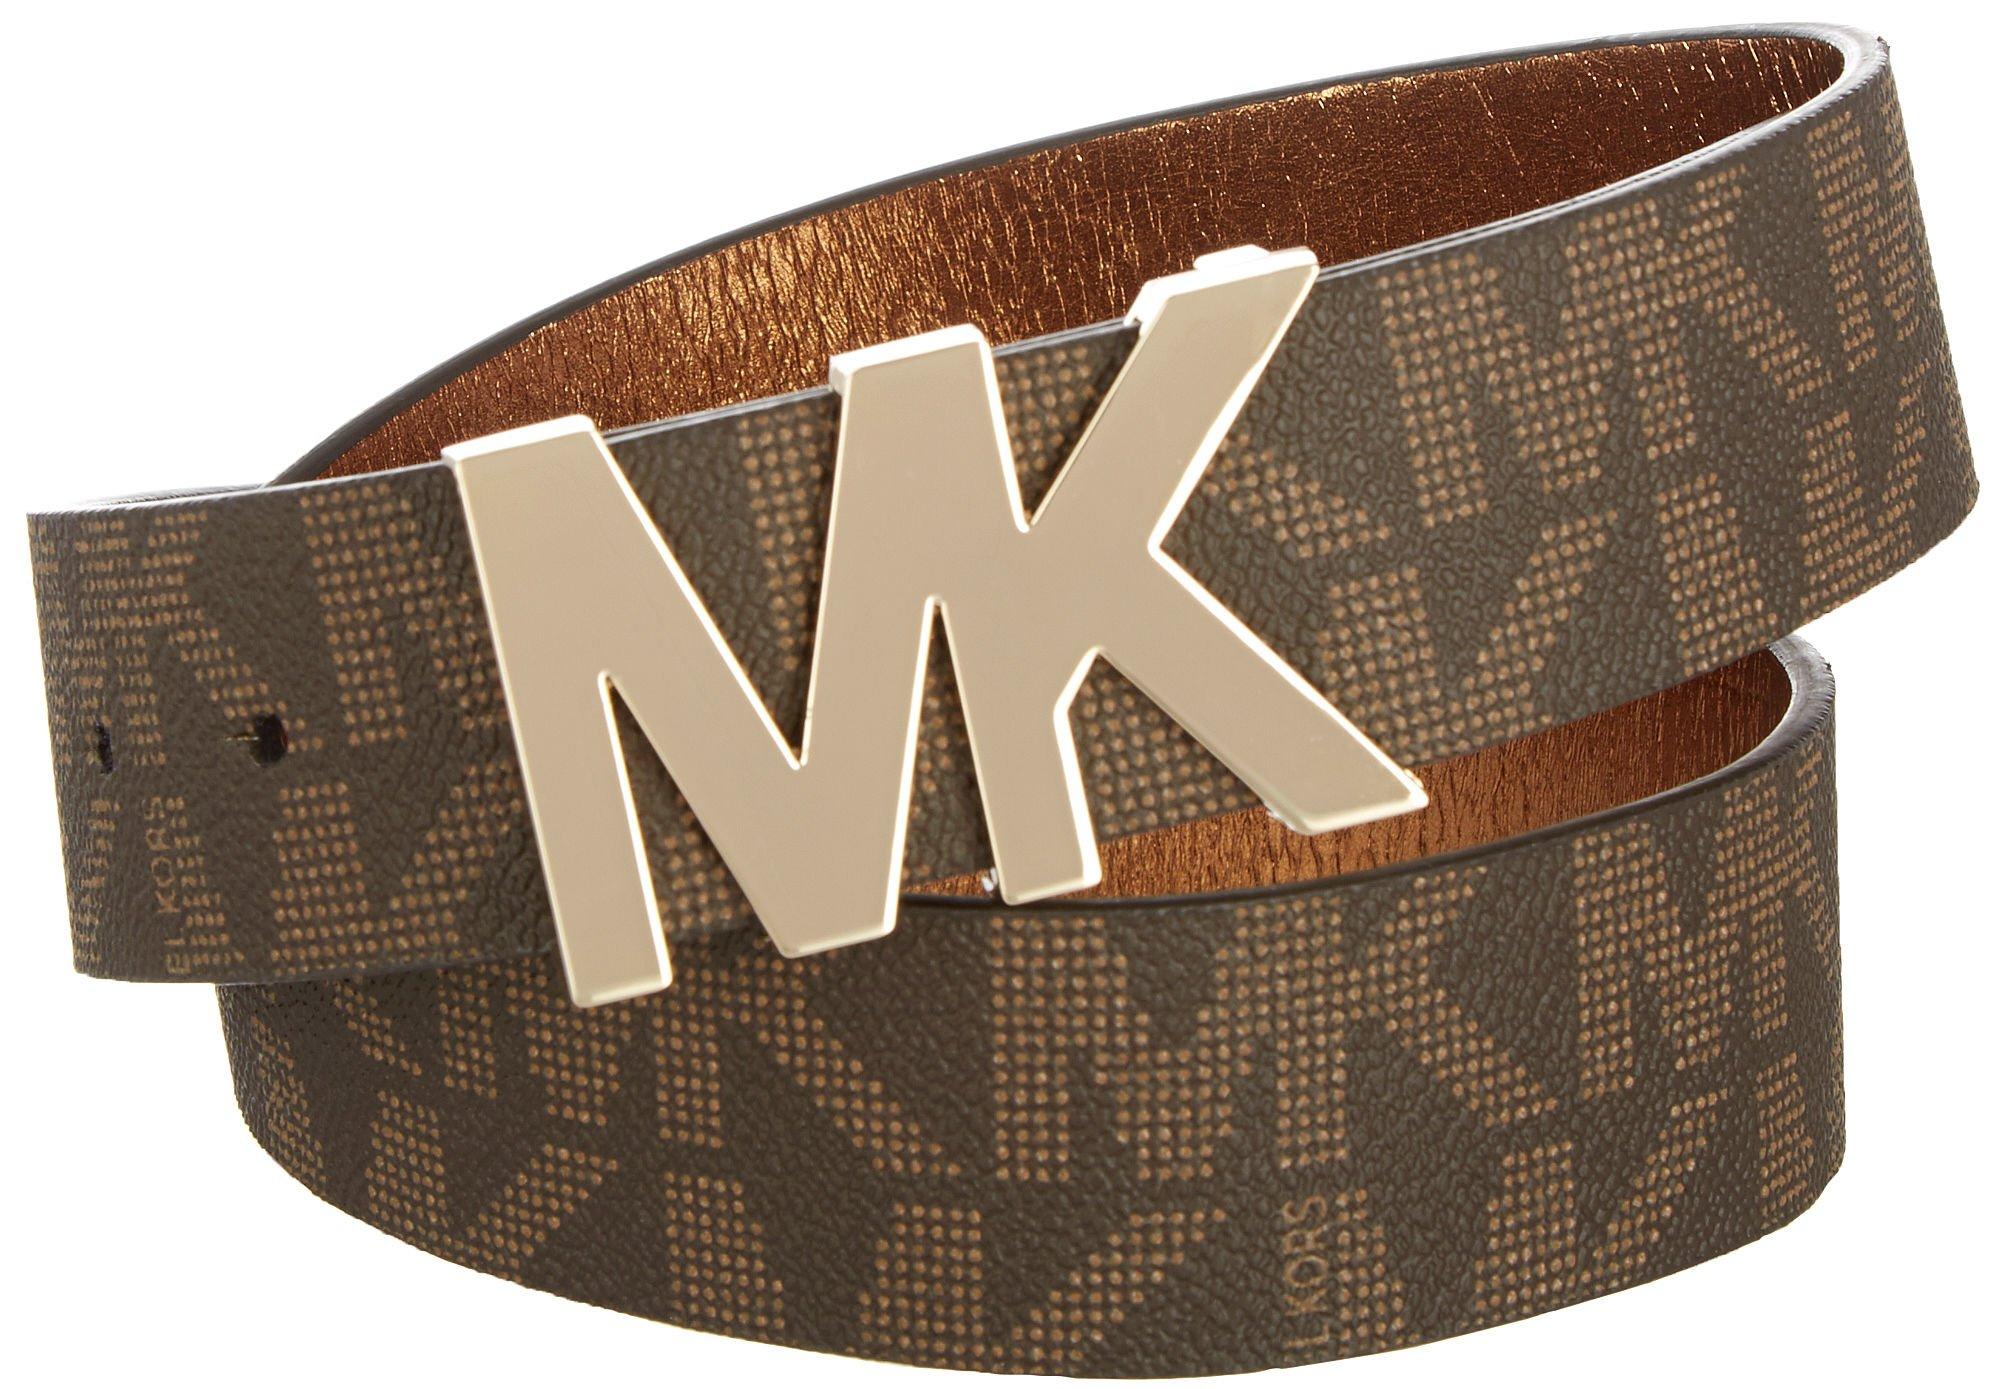 MICHAEL Michael Kors Belt, MK Logo Belt